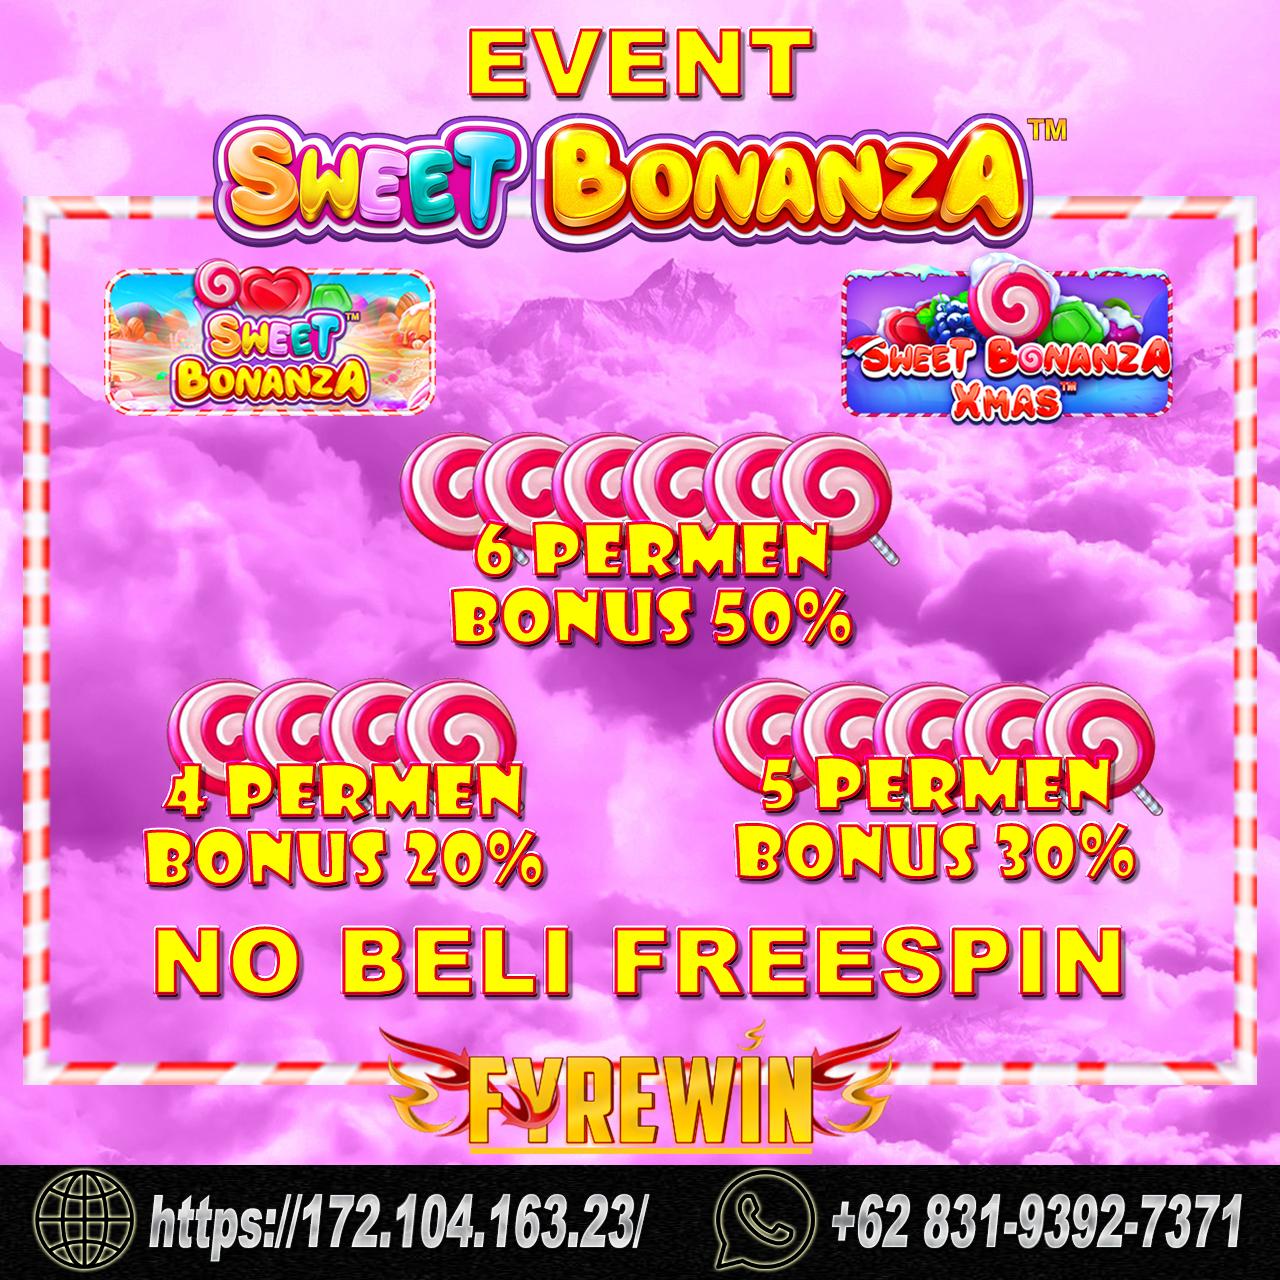 EVENT SWEET BONANZA